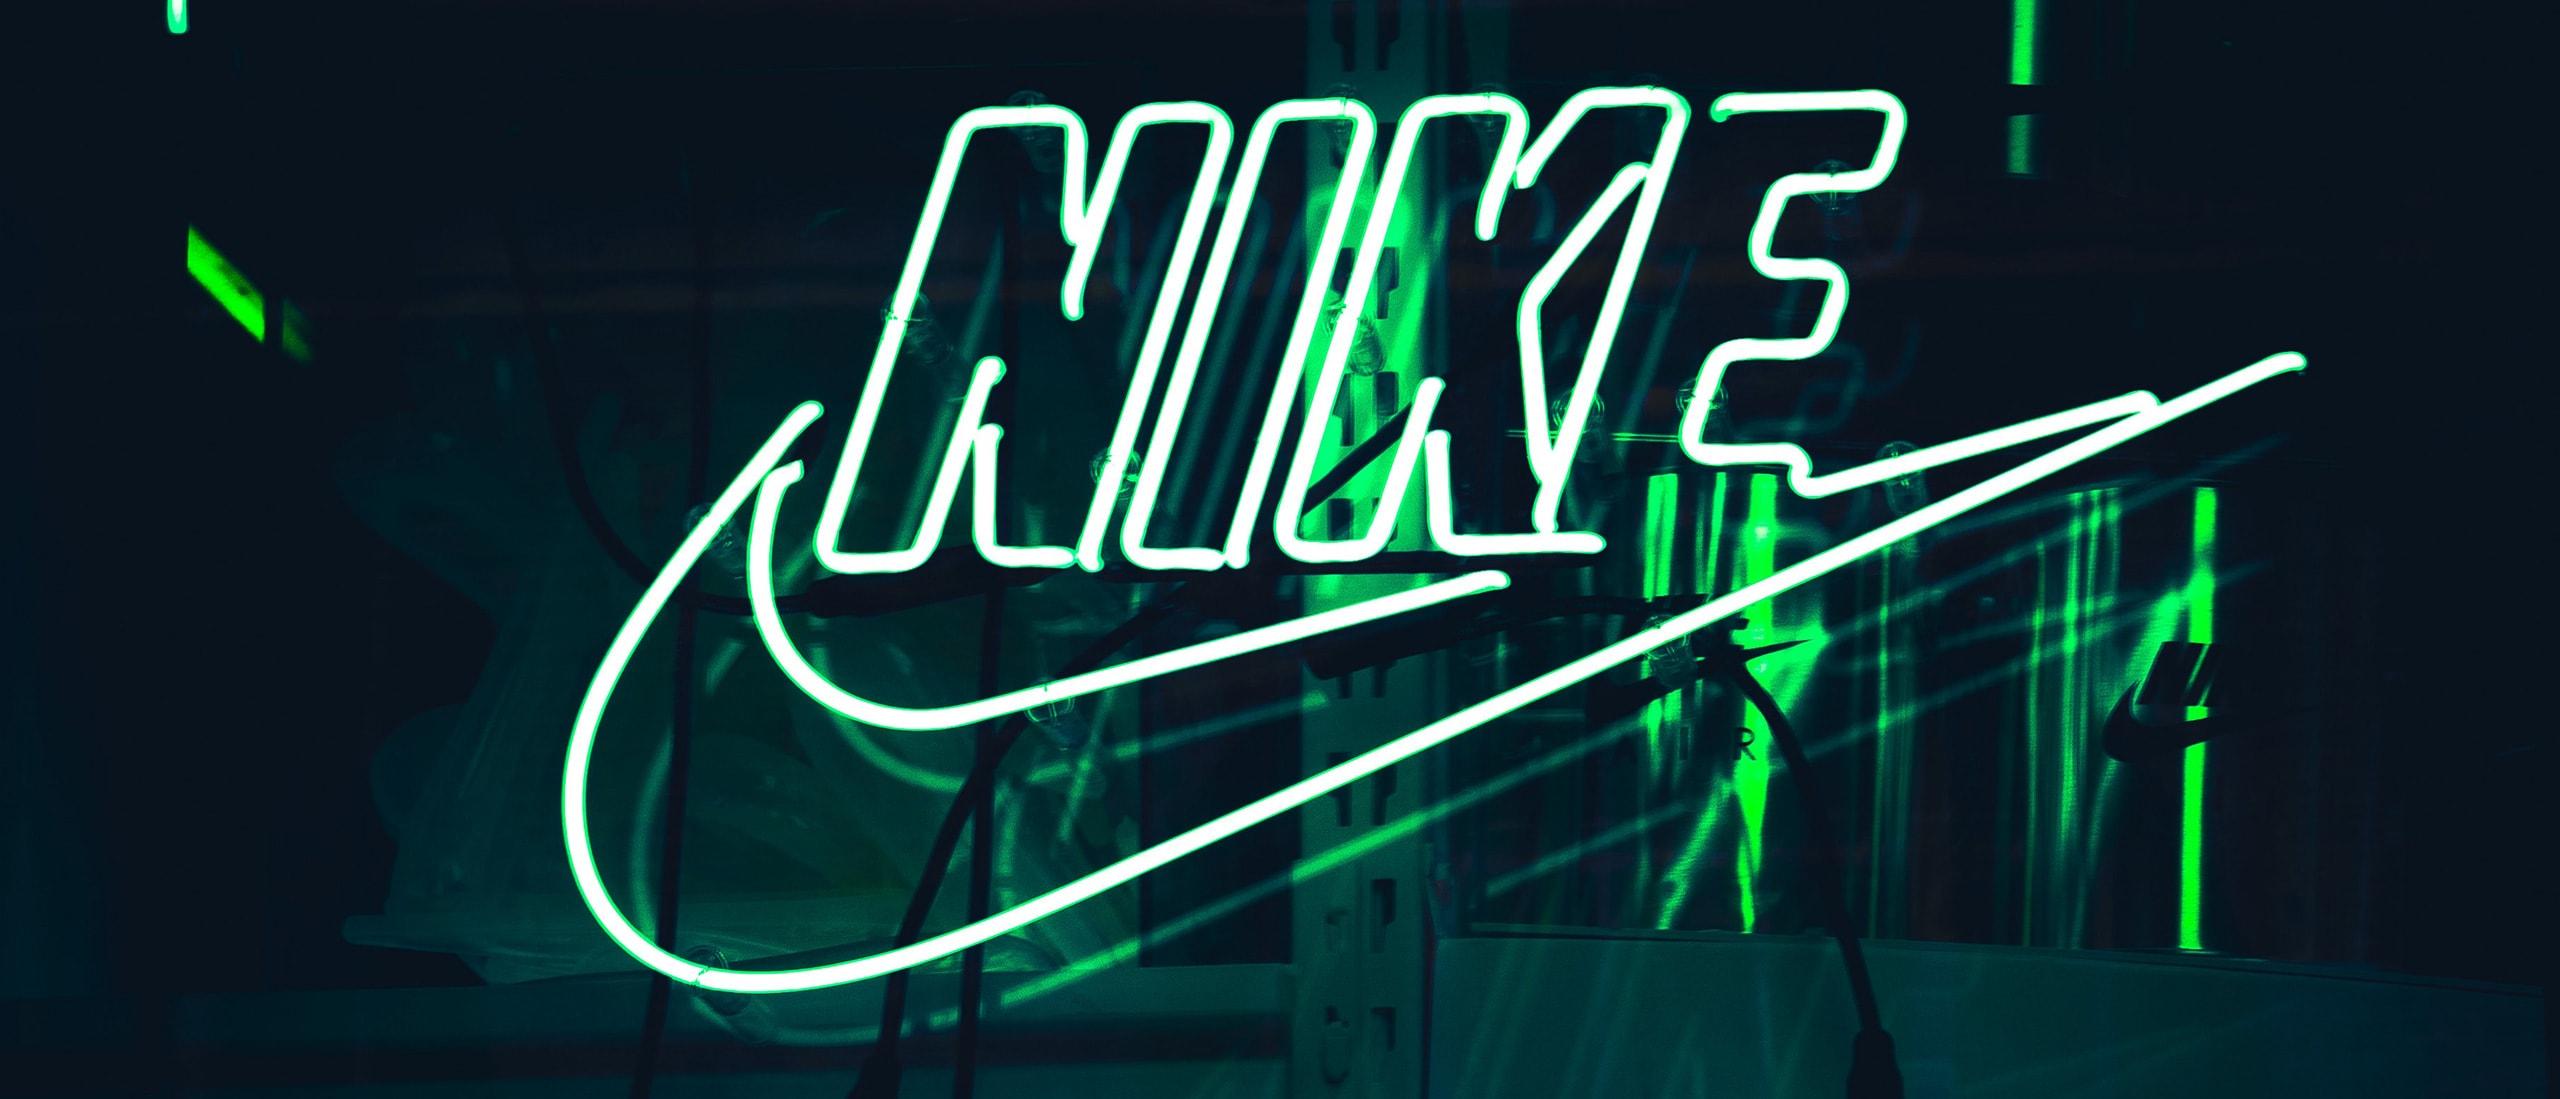 Nike, Neon Sign